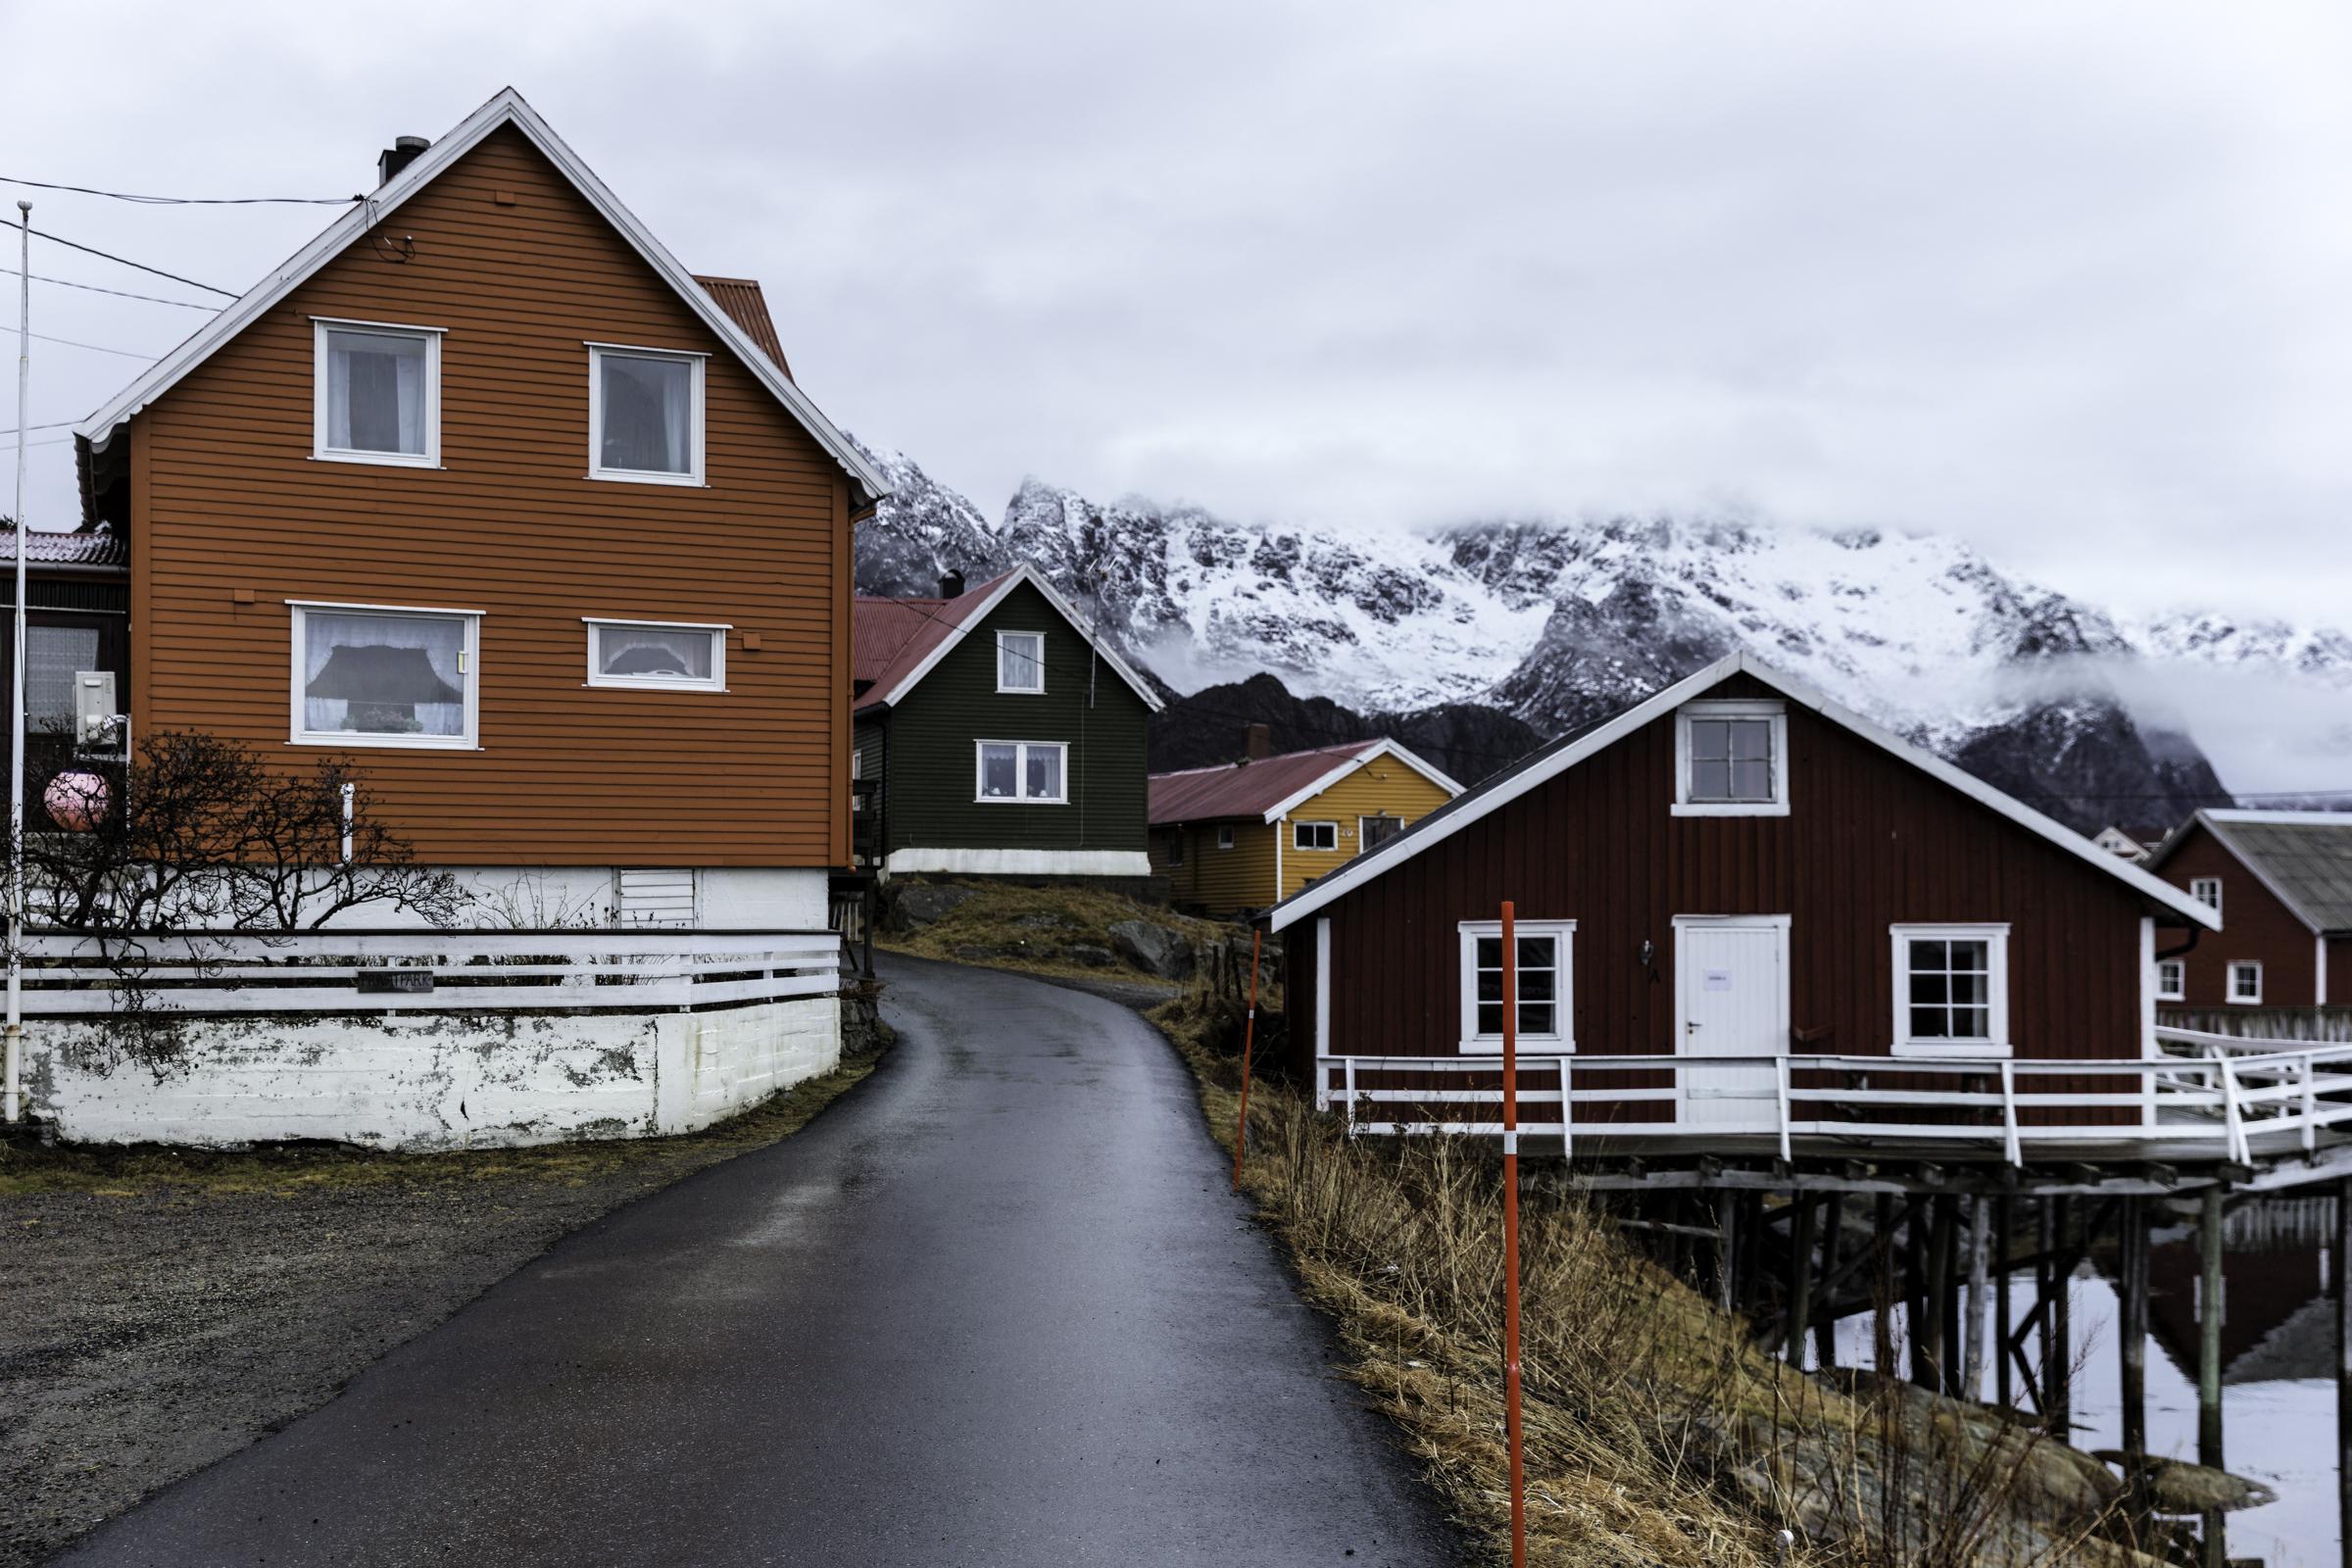 TKeyes_TKeyes_Norway~0168.jpg